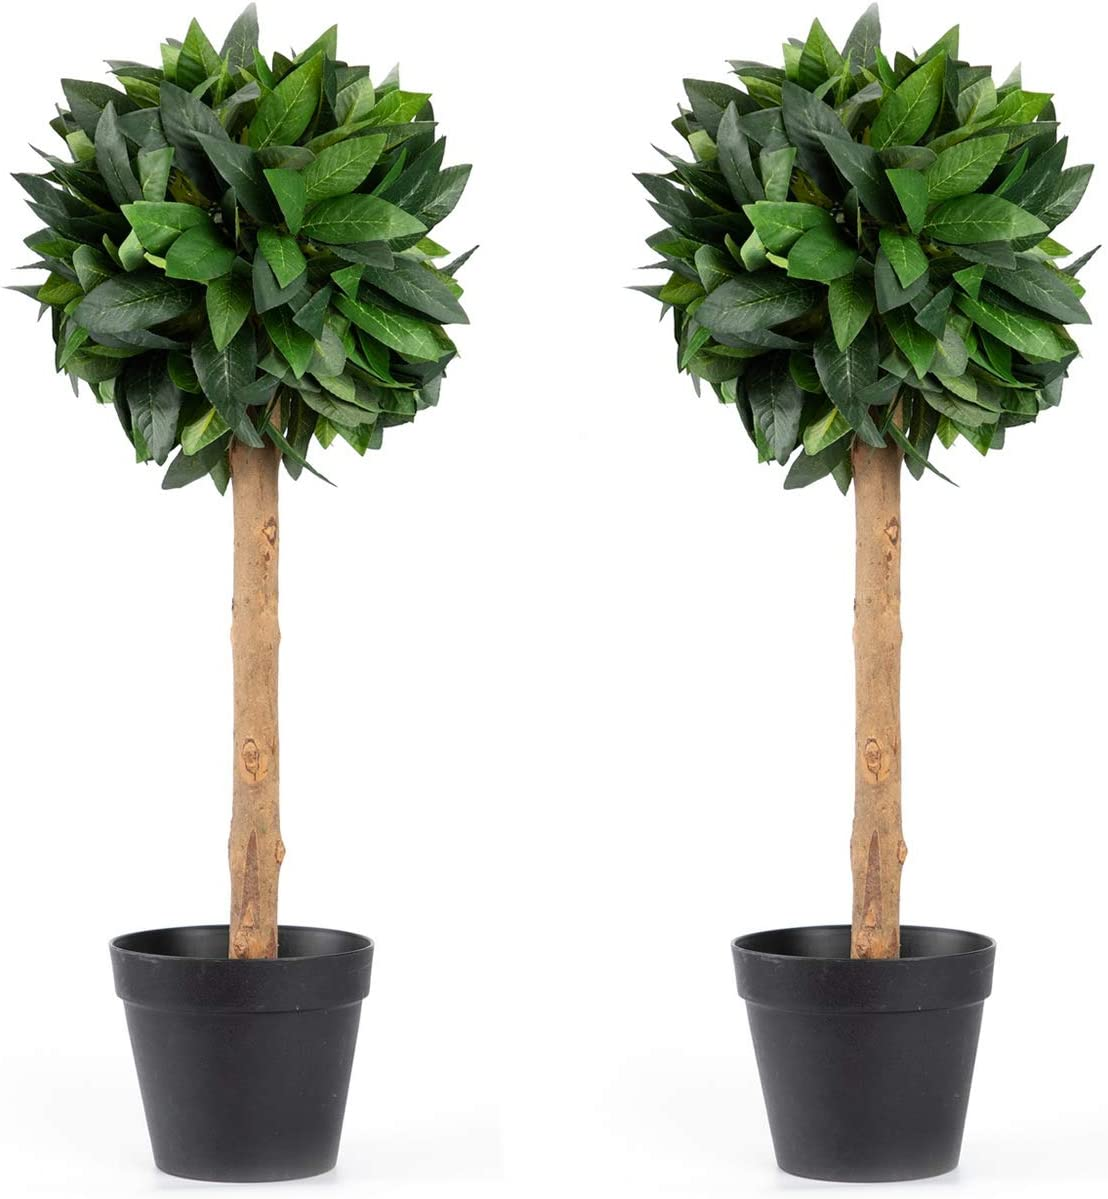 Velener 2' Silk Artificial Boxwood Topiary Ball Pot in for Cash special price Tree SALENEW very popular